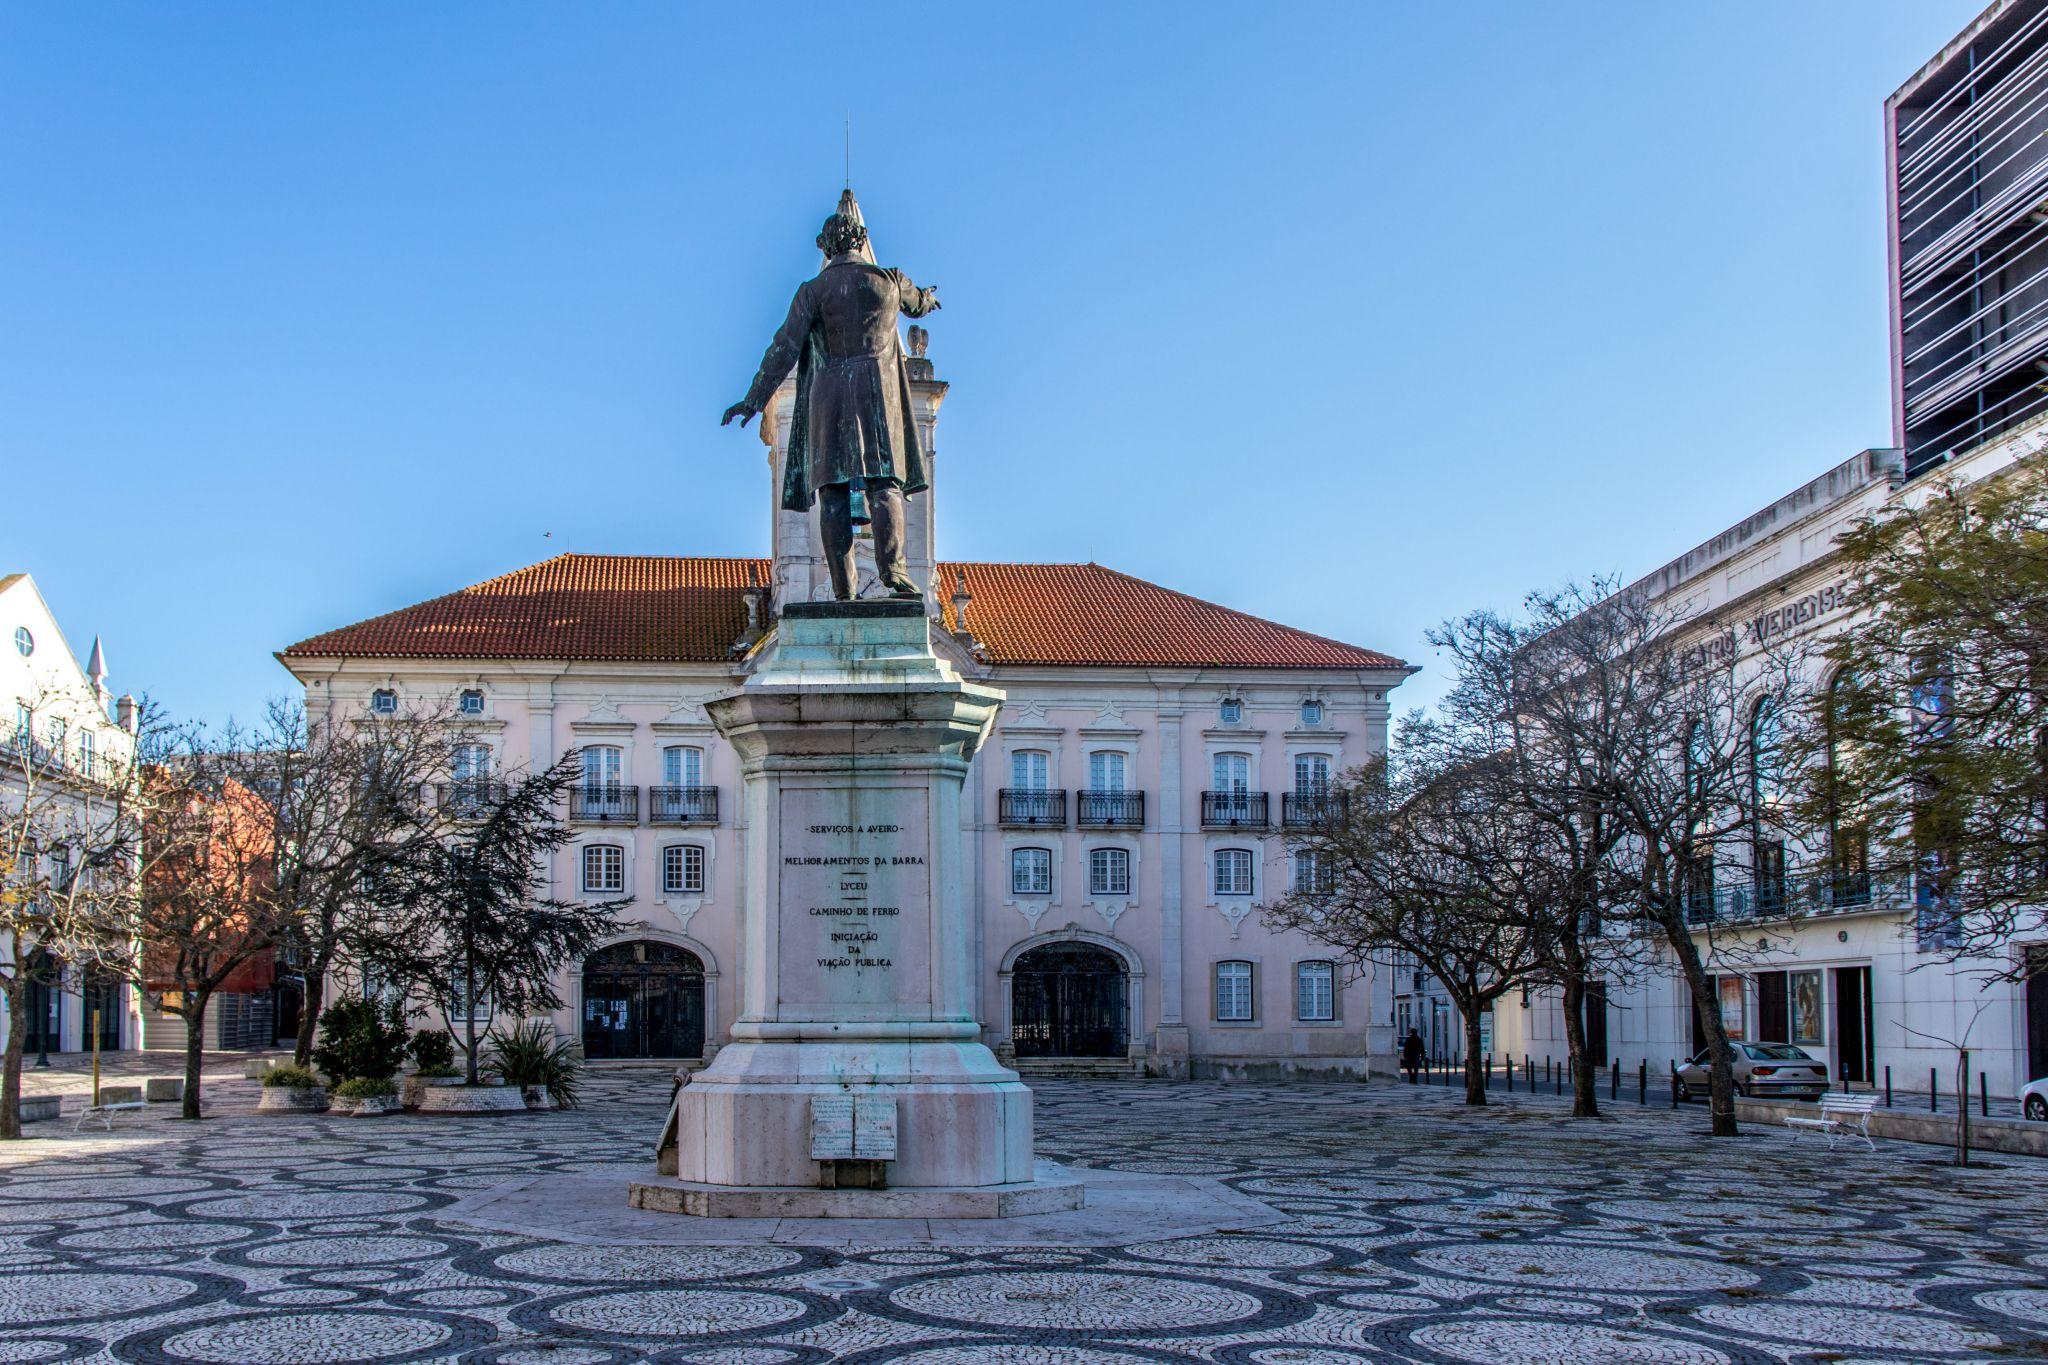 City Hall, Portugal